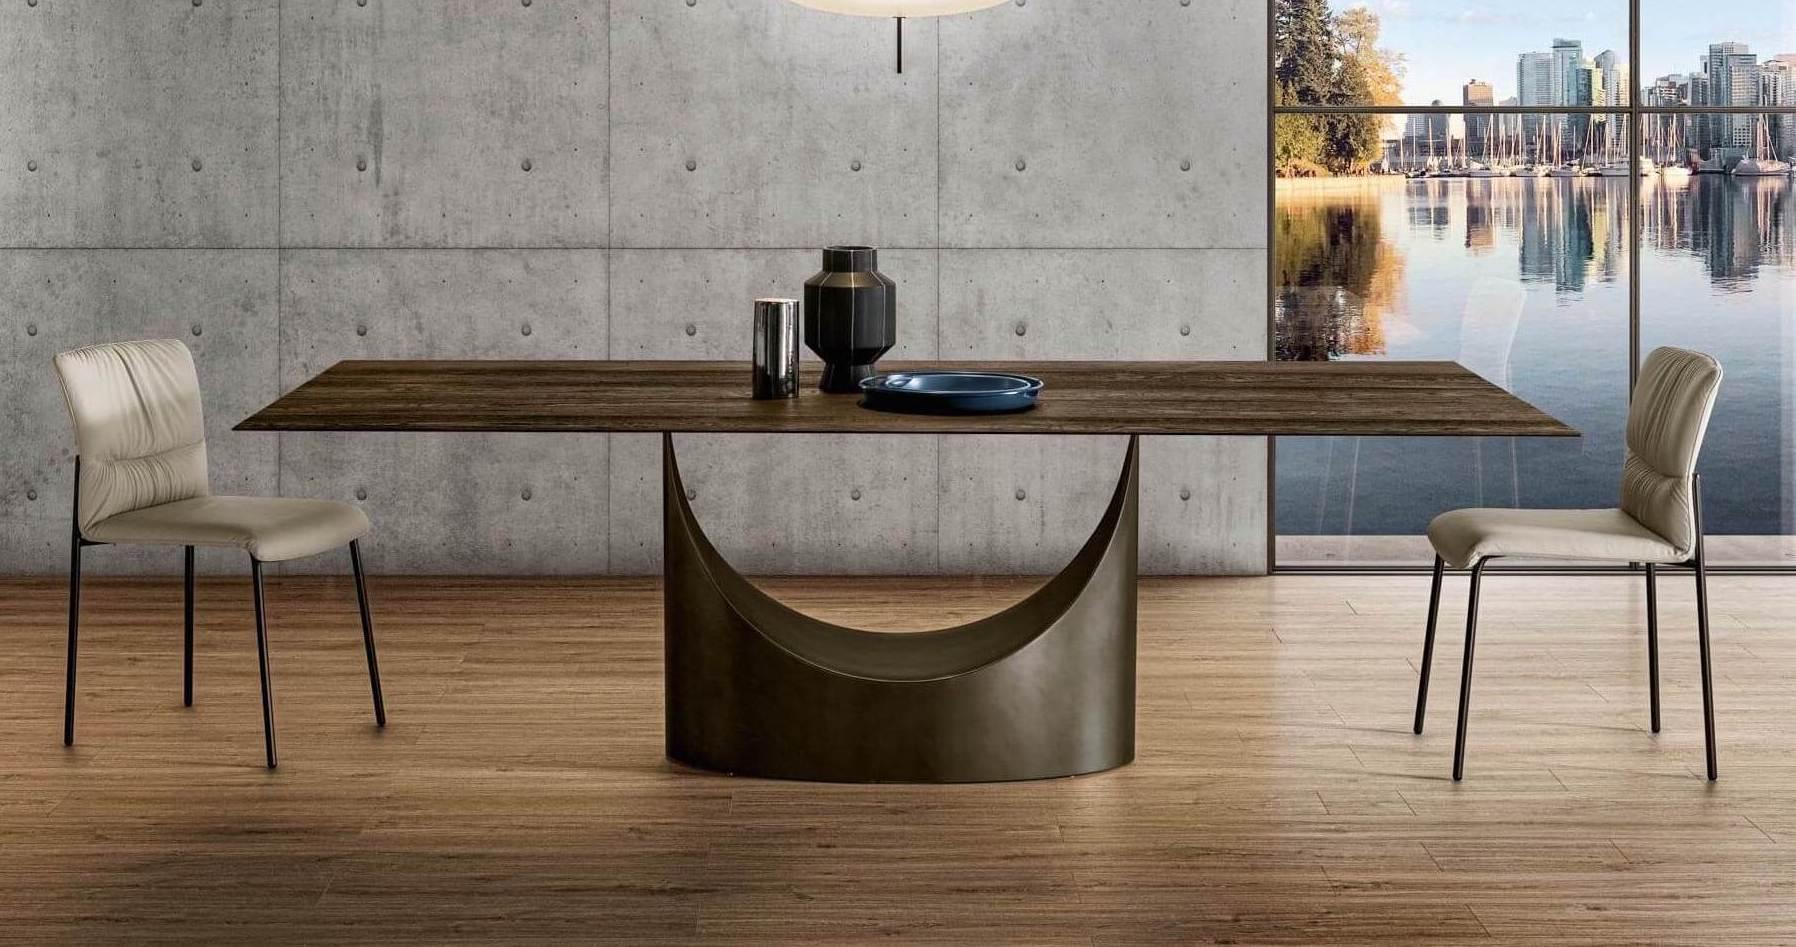 Milano Design Week 2019 - nové produkty